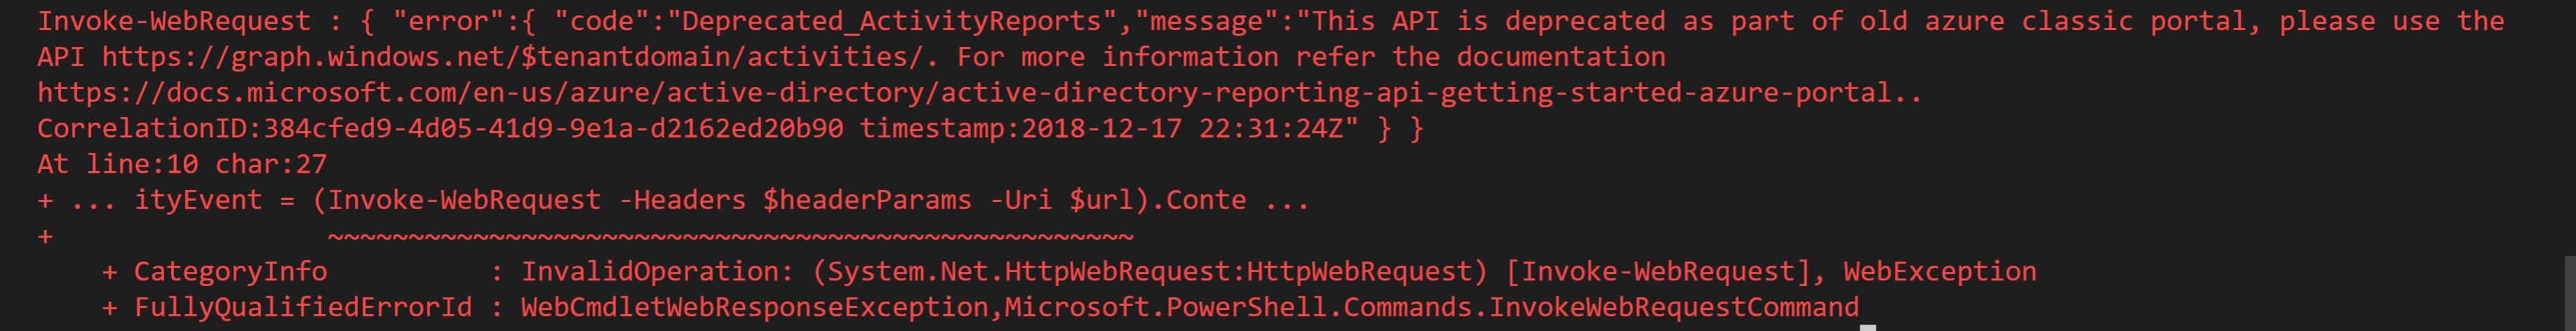 API Deprecated.PNG